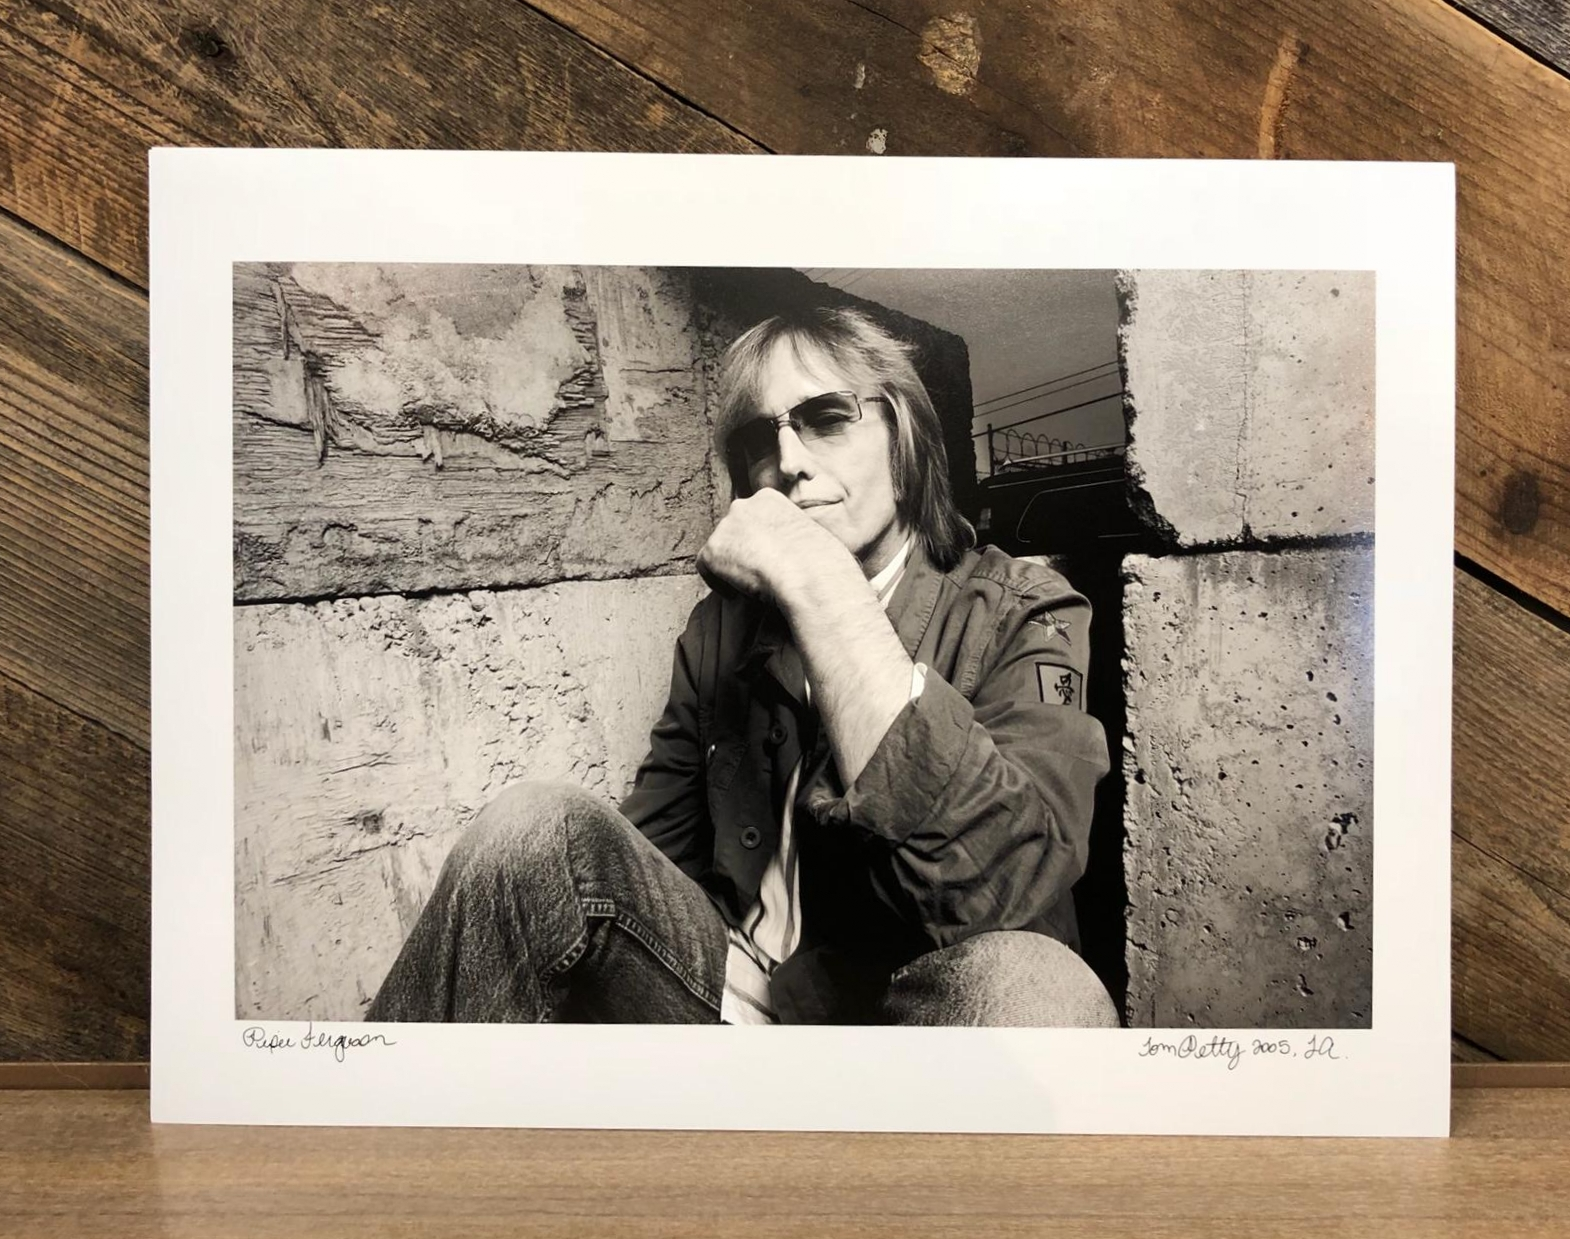 Tom Petty Photo Print, $75